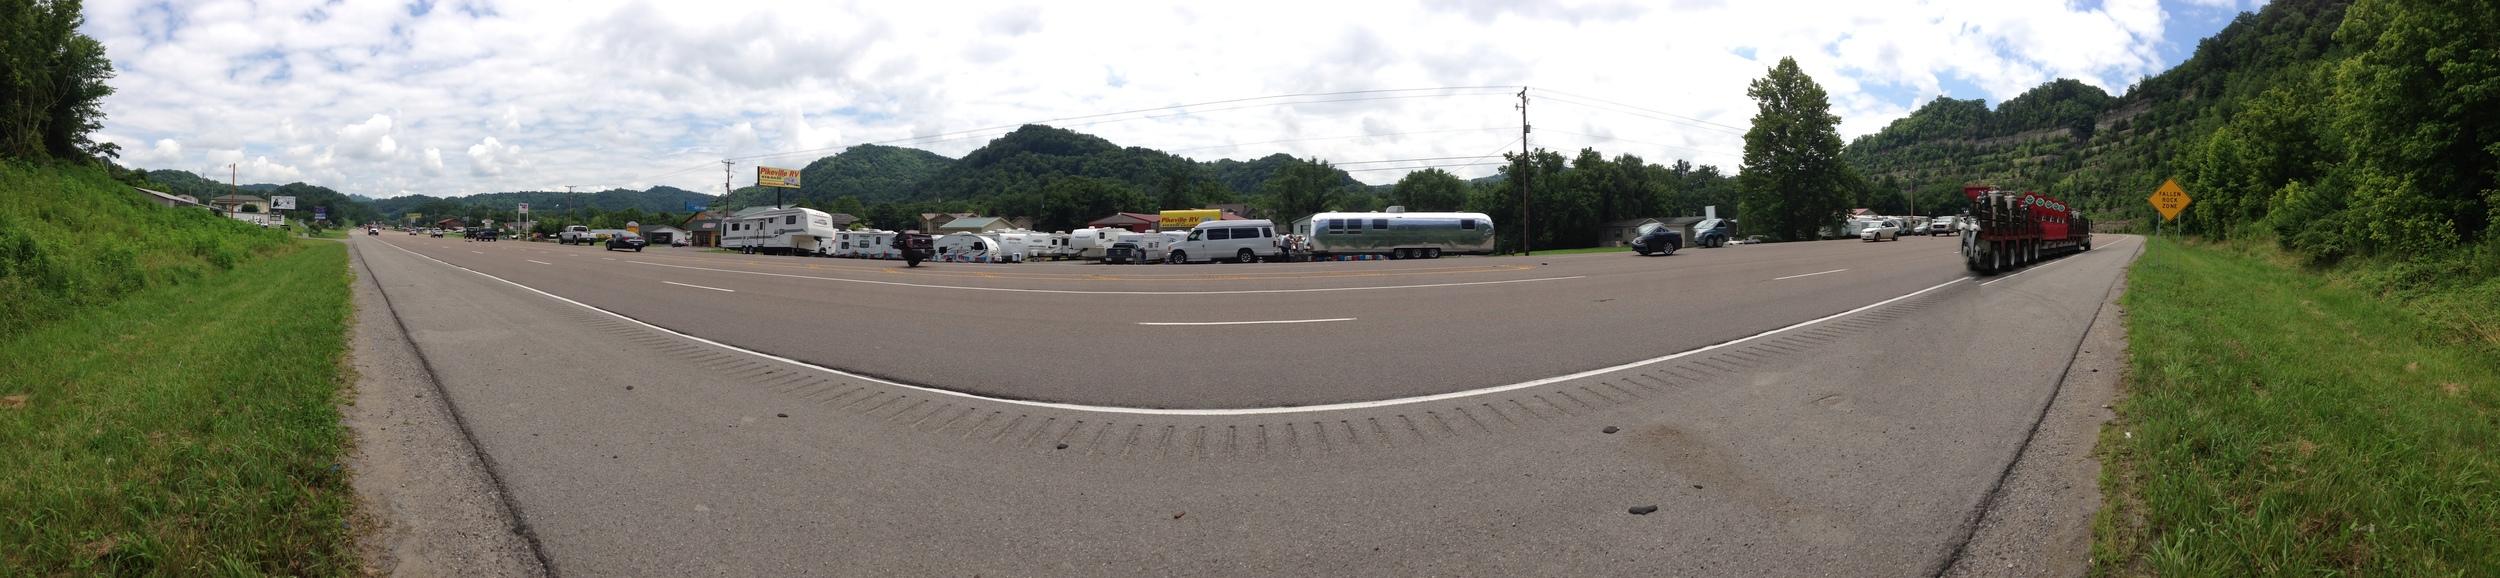 A non-descript RV repair shop on the side of the road.